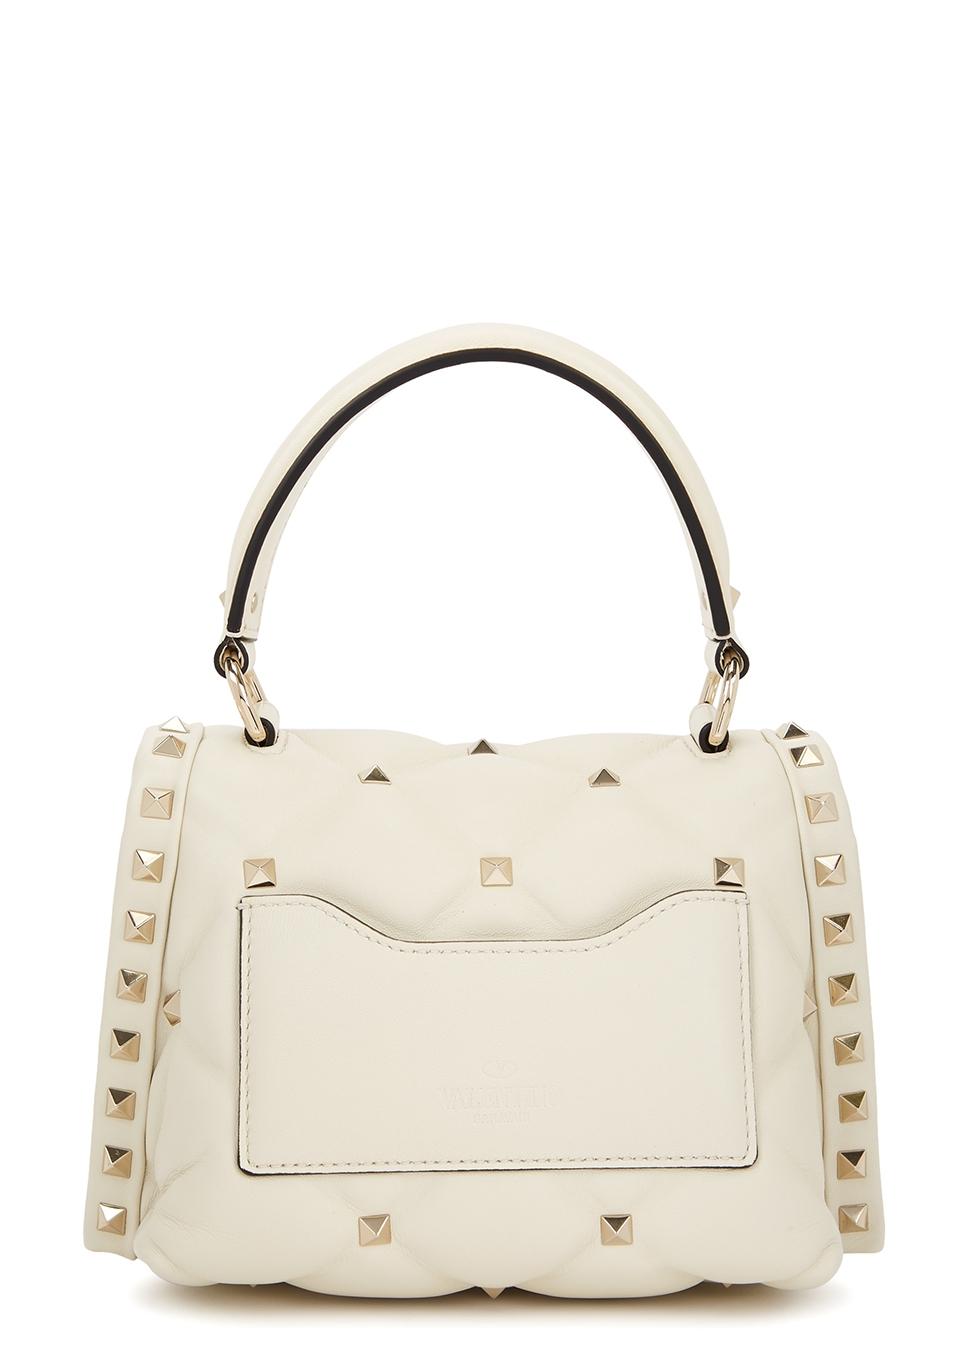 Candystud mini ivory leather top handle bag - Valentino Garavani